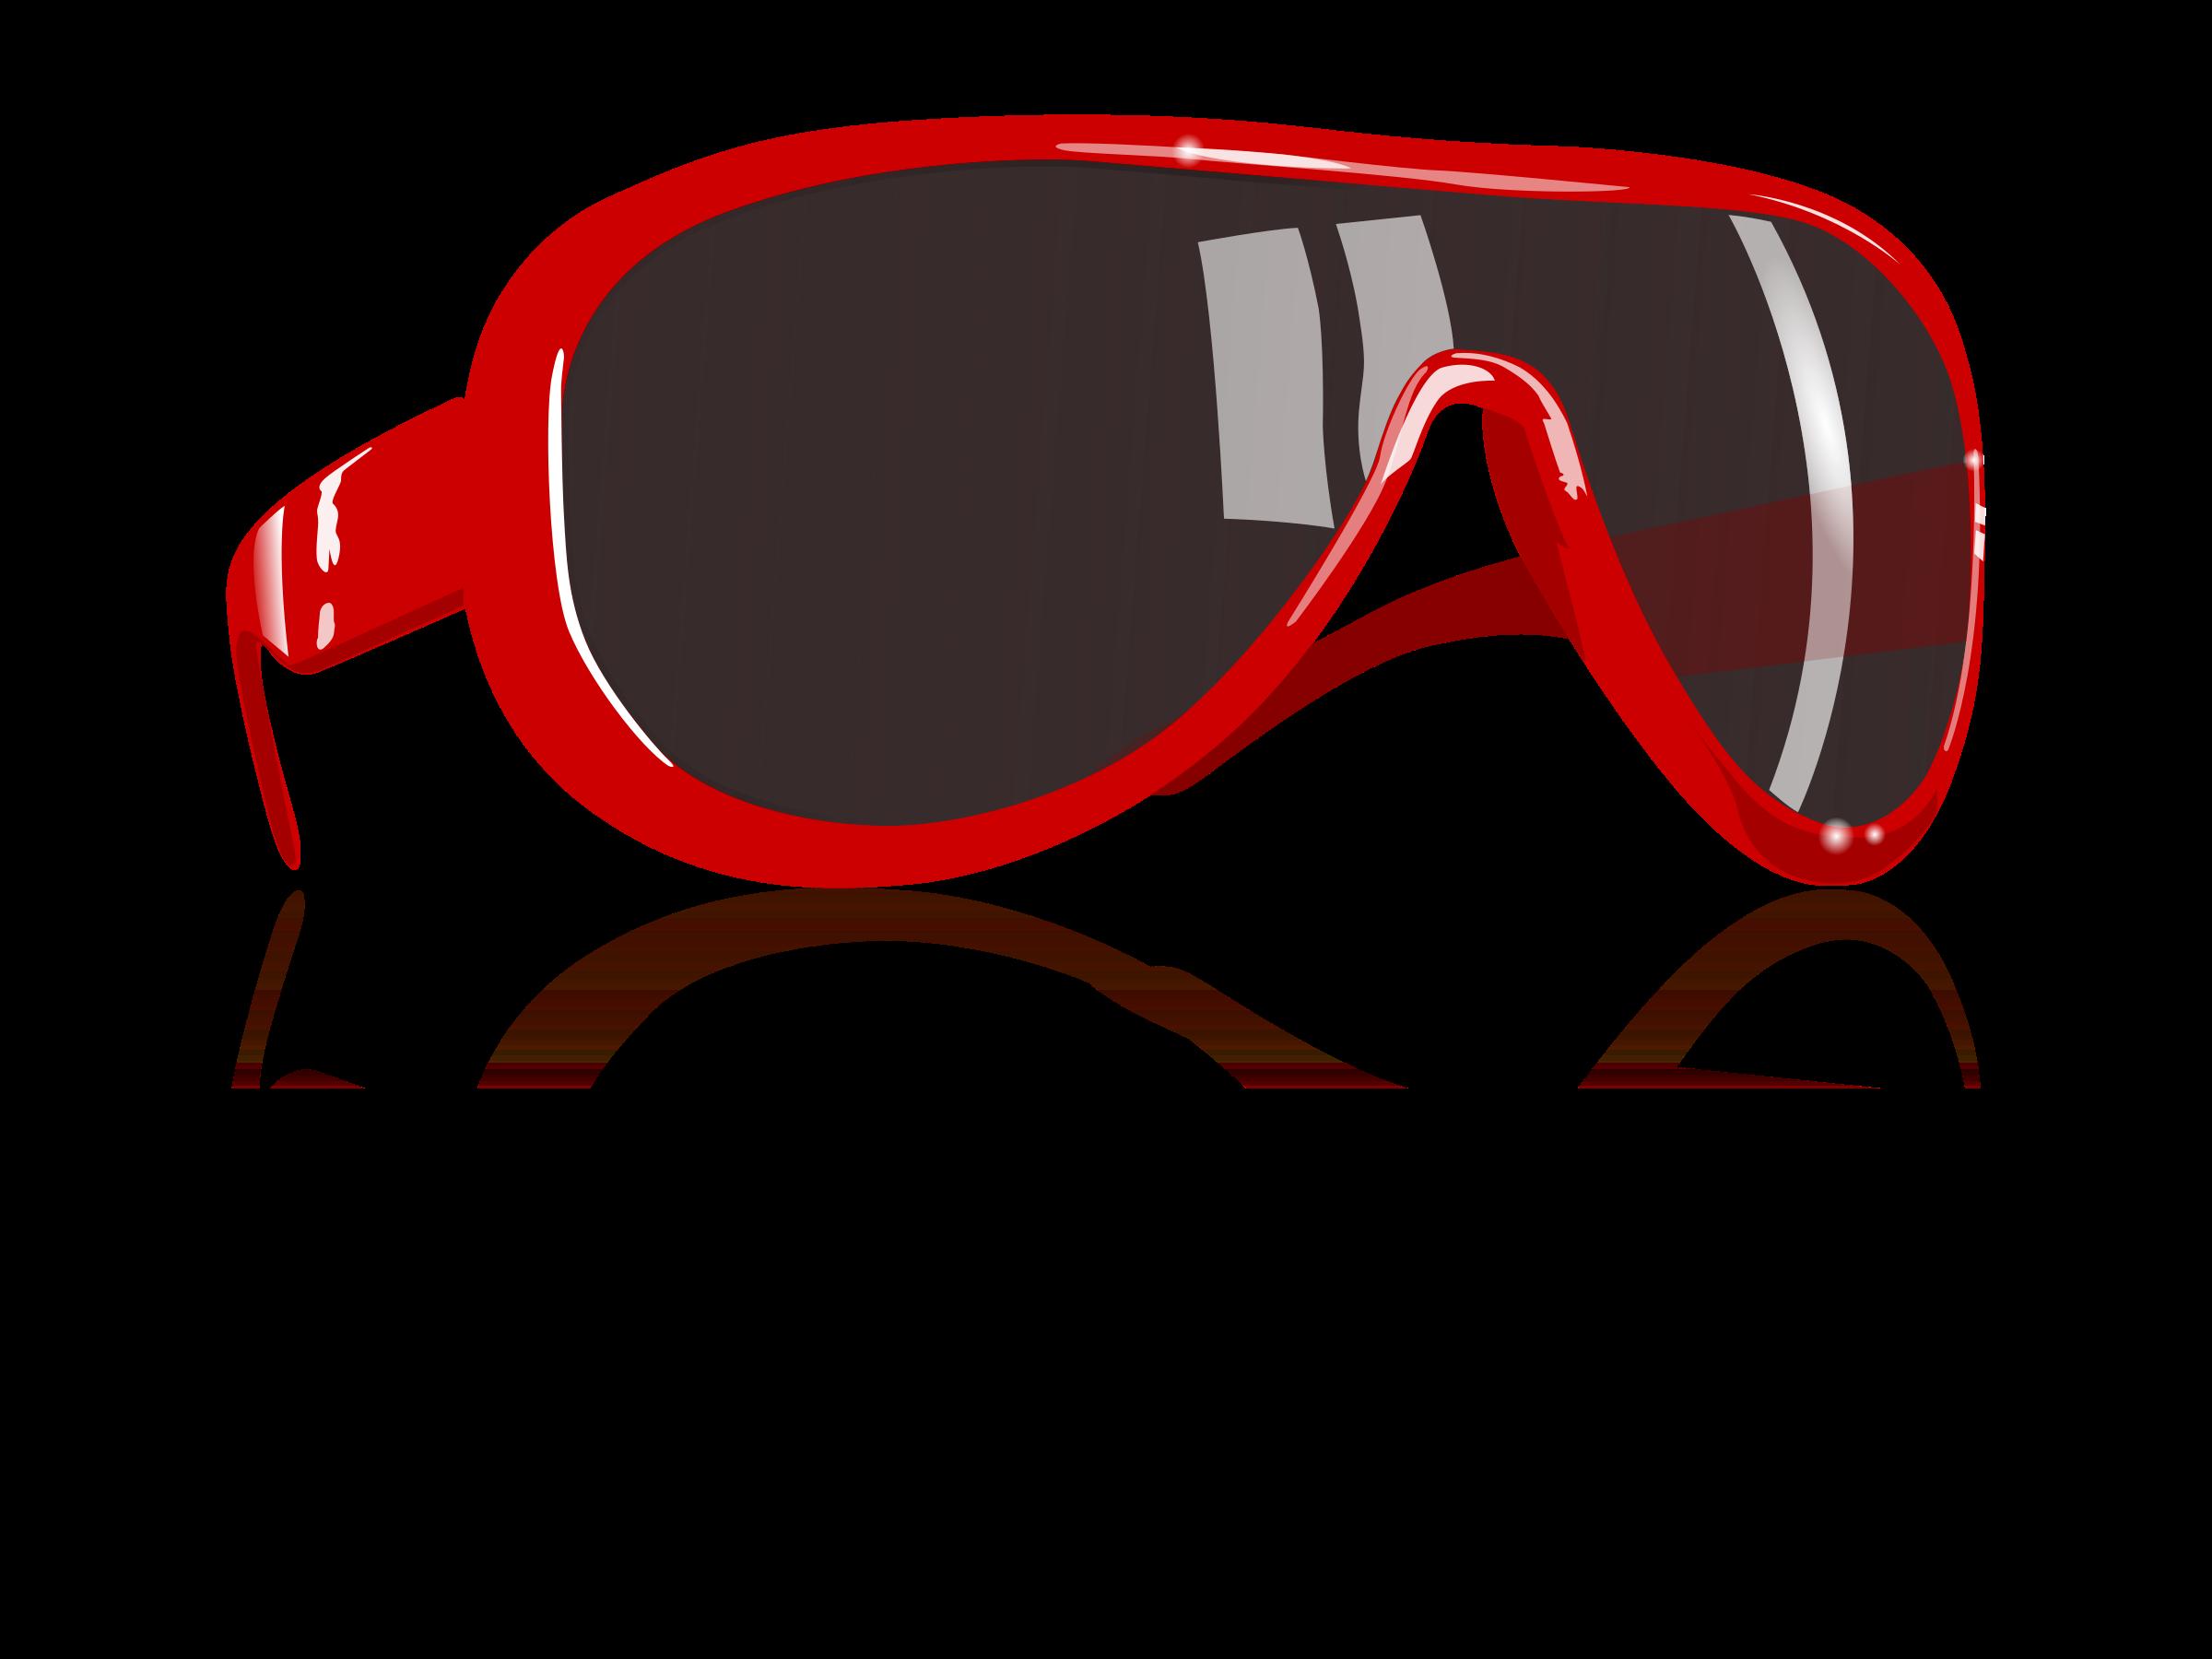 Big image png. Sunglasses clipart woman clipart